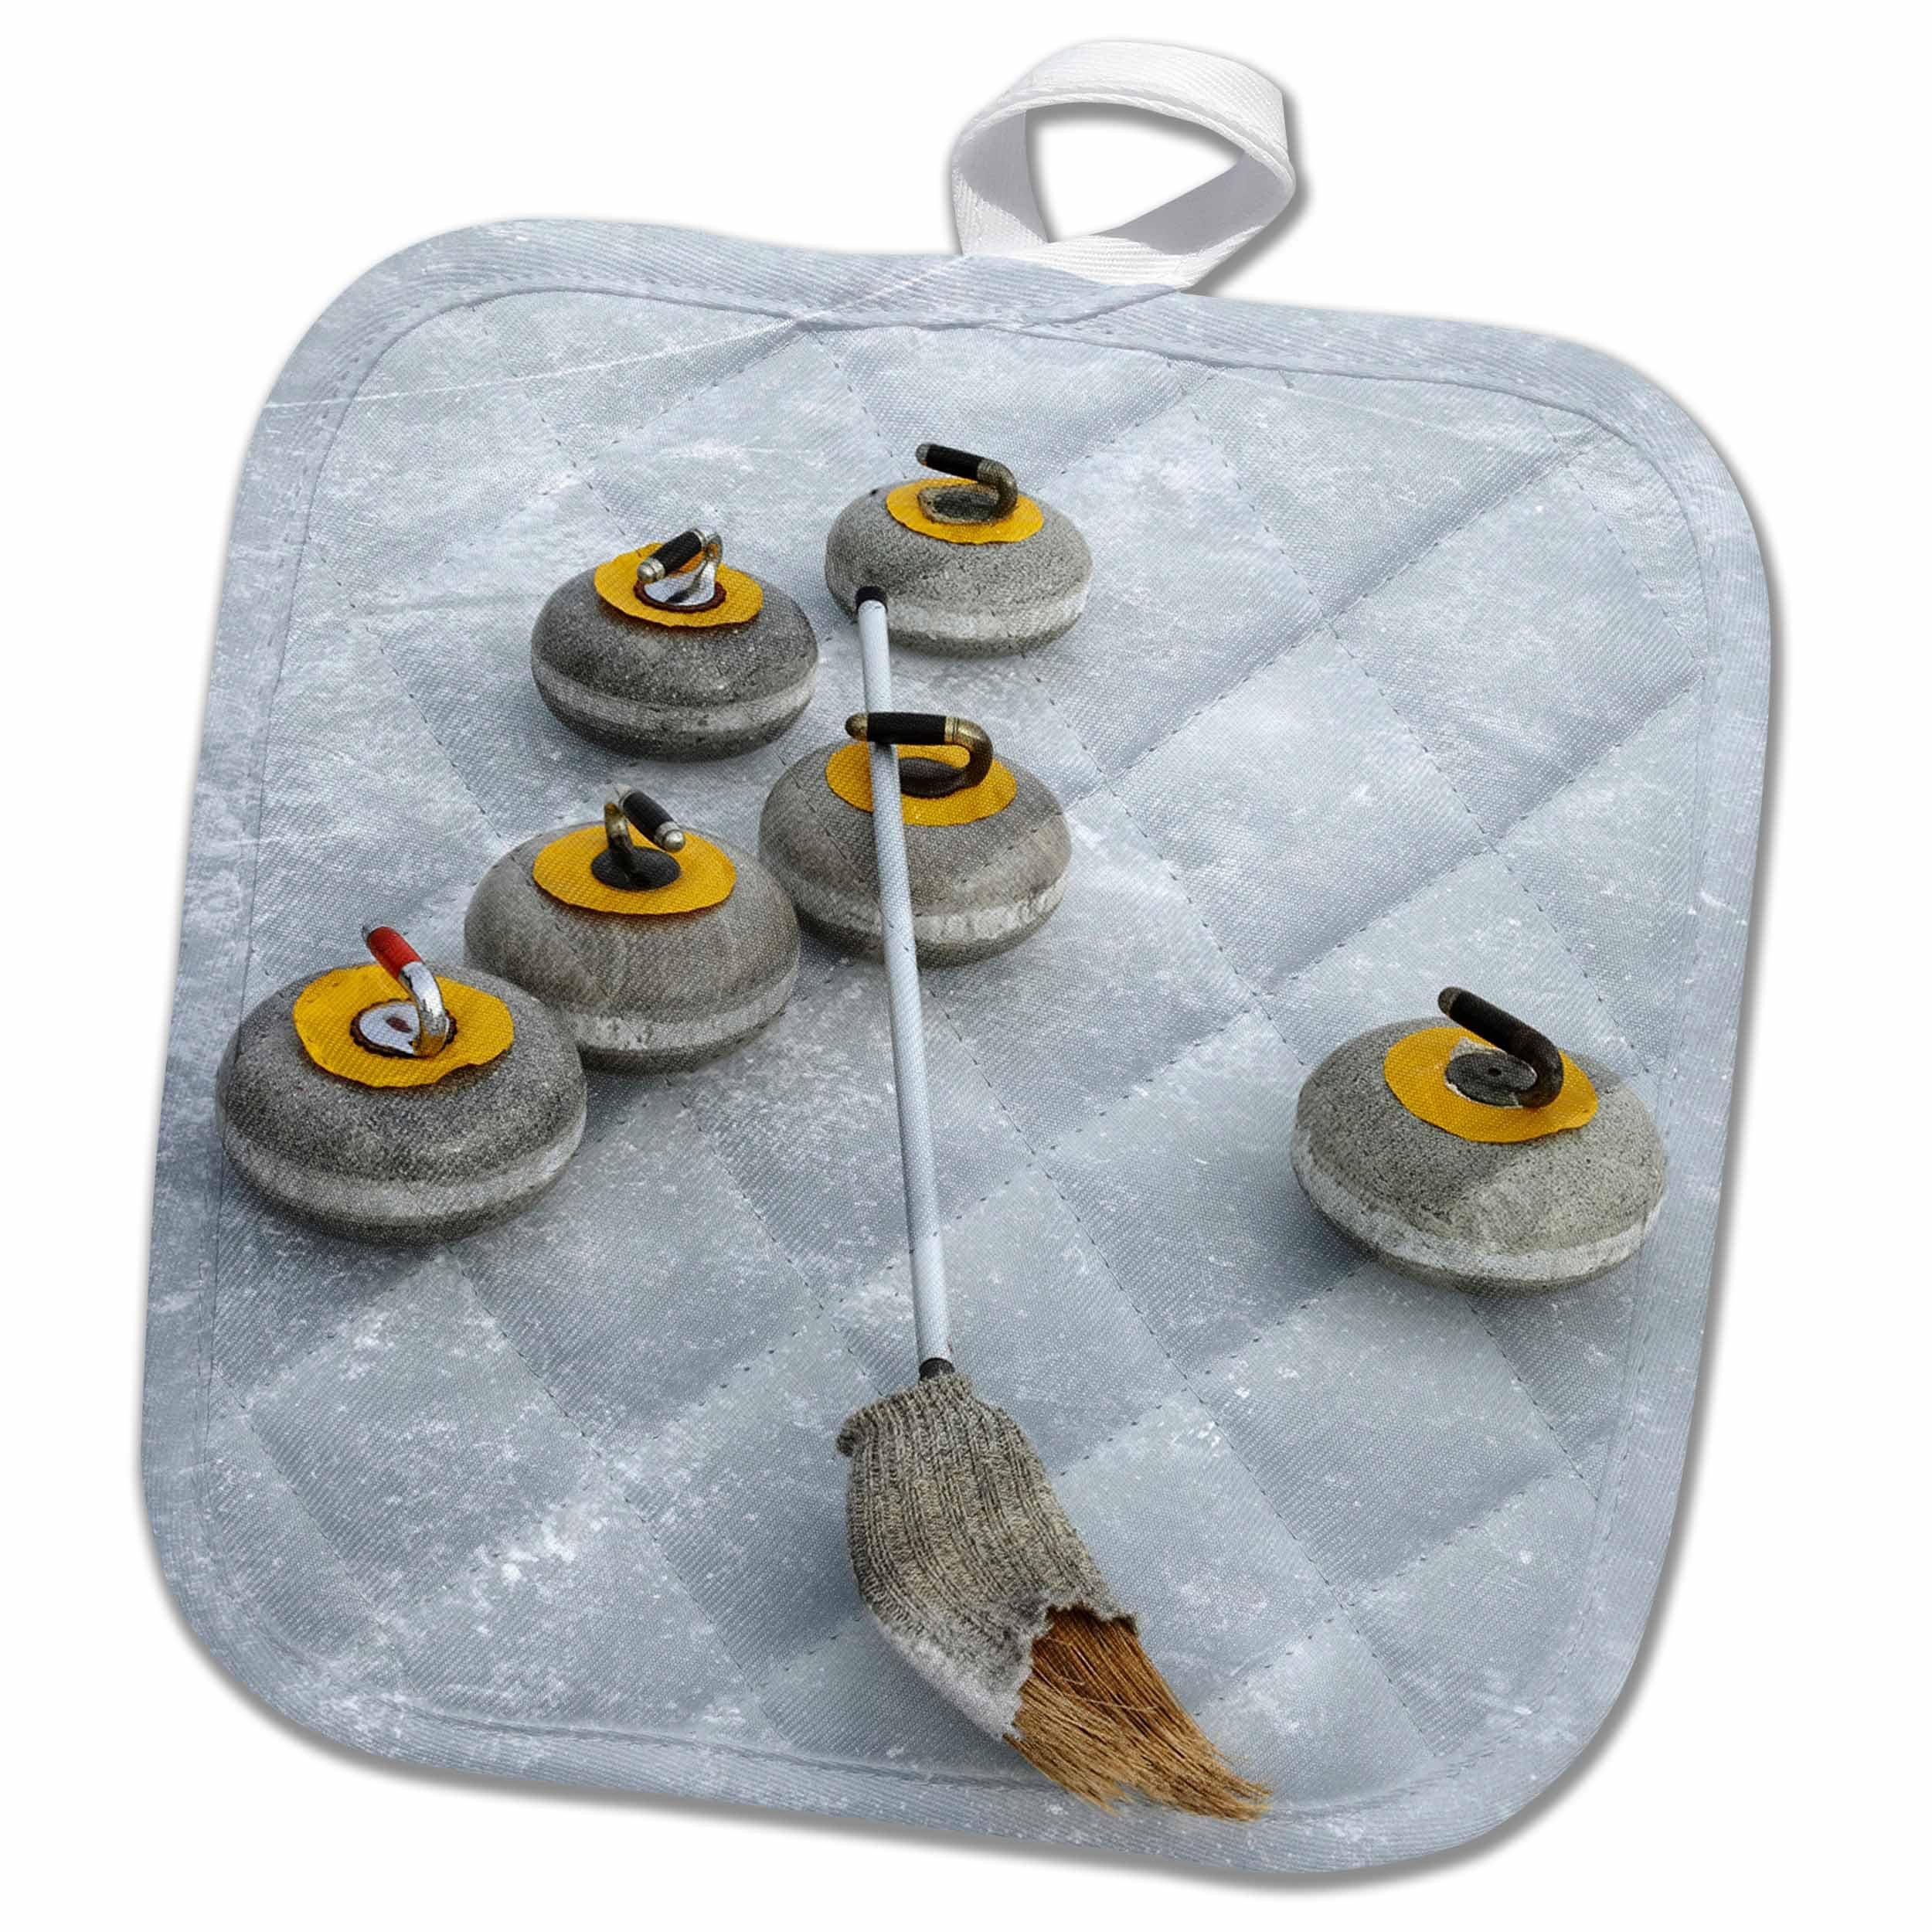 3D Rose Curling Stones-Idaburn Dam-South Island-New Zealand-Au02 Dwa4682-David Wall Pot Holder, 8'' x 8''